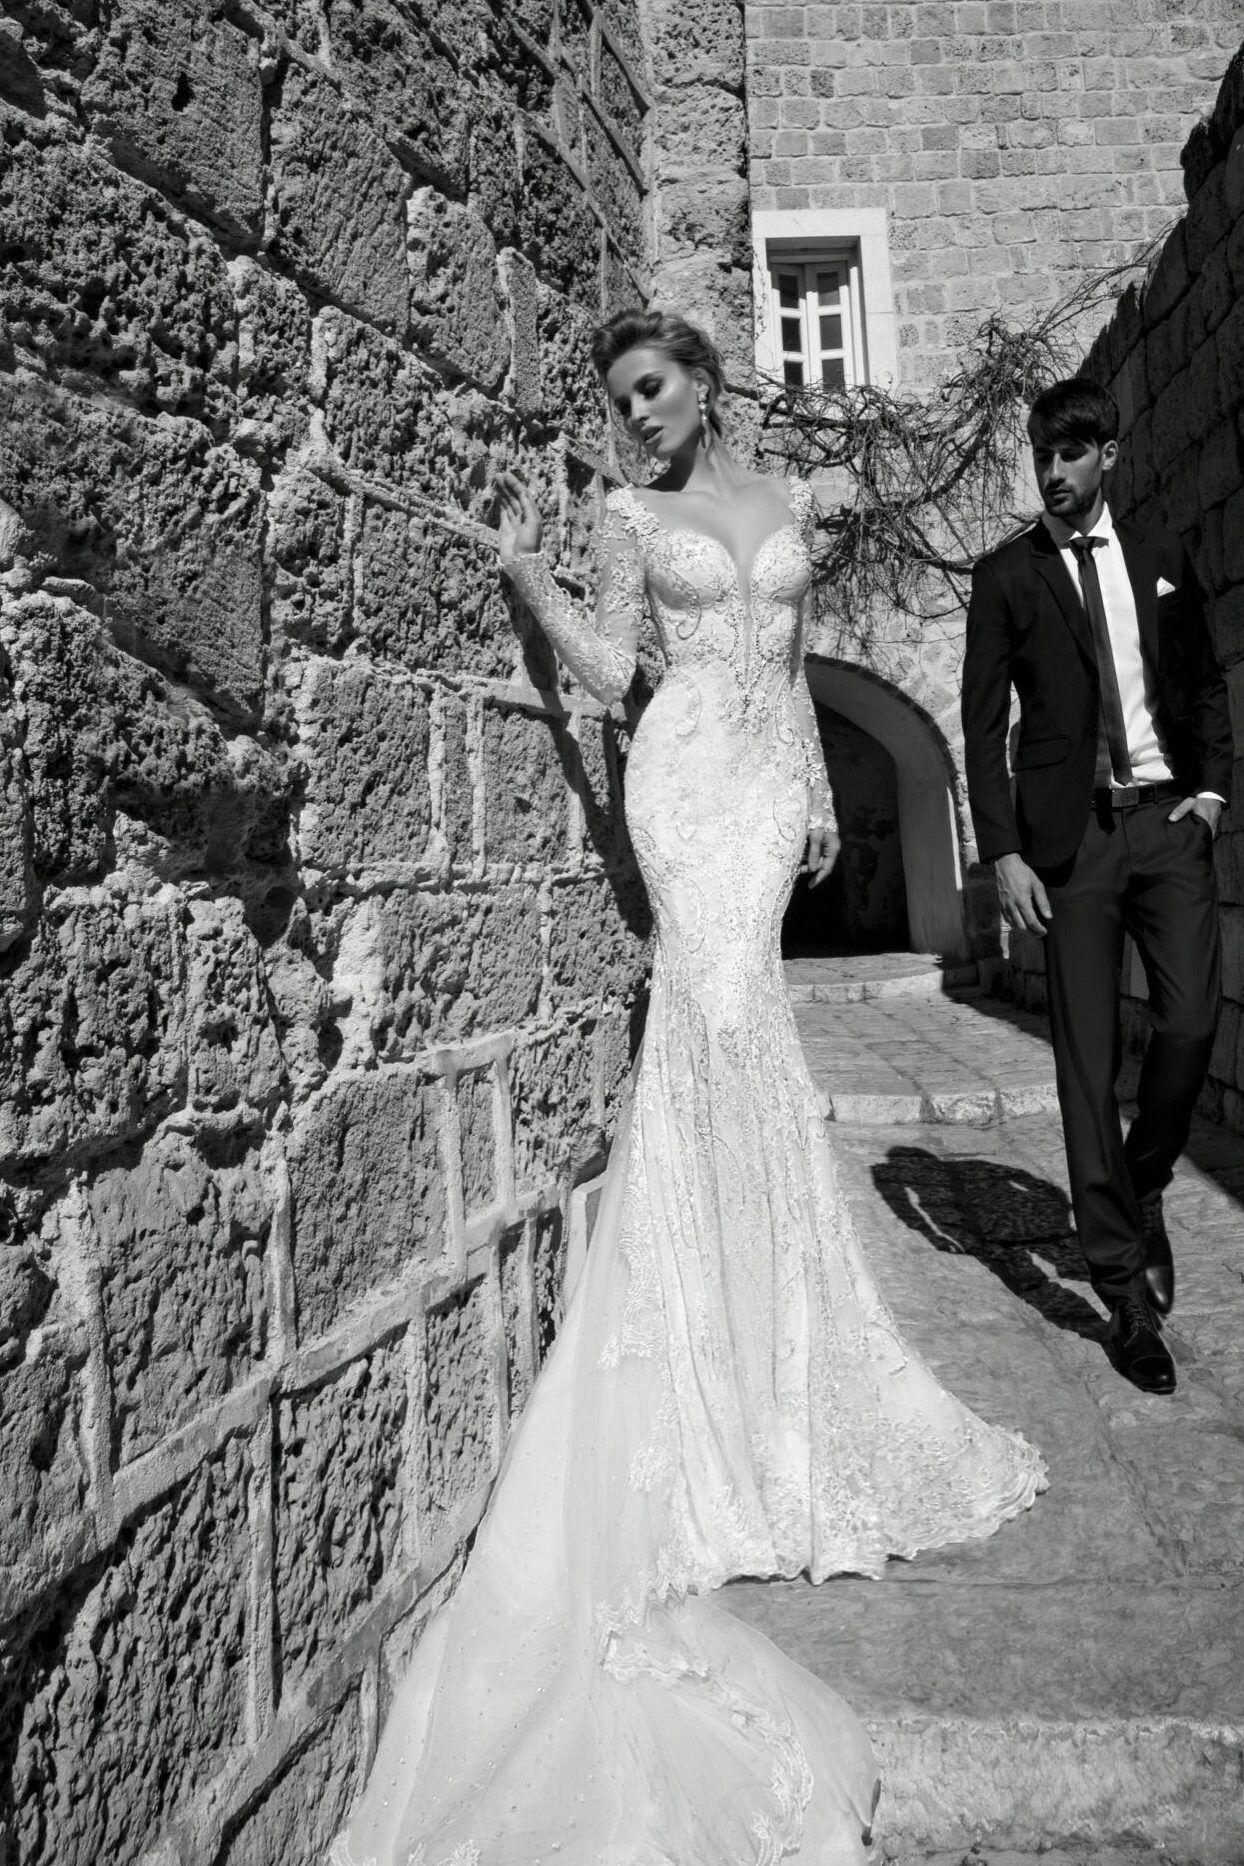 Related image weddings pinterest galia lahav wedding dress